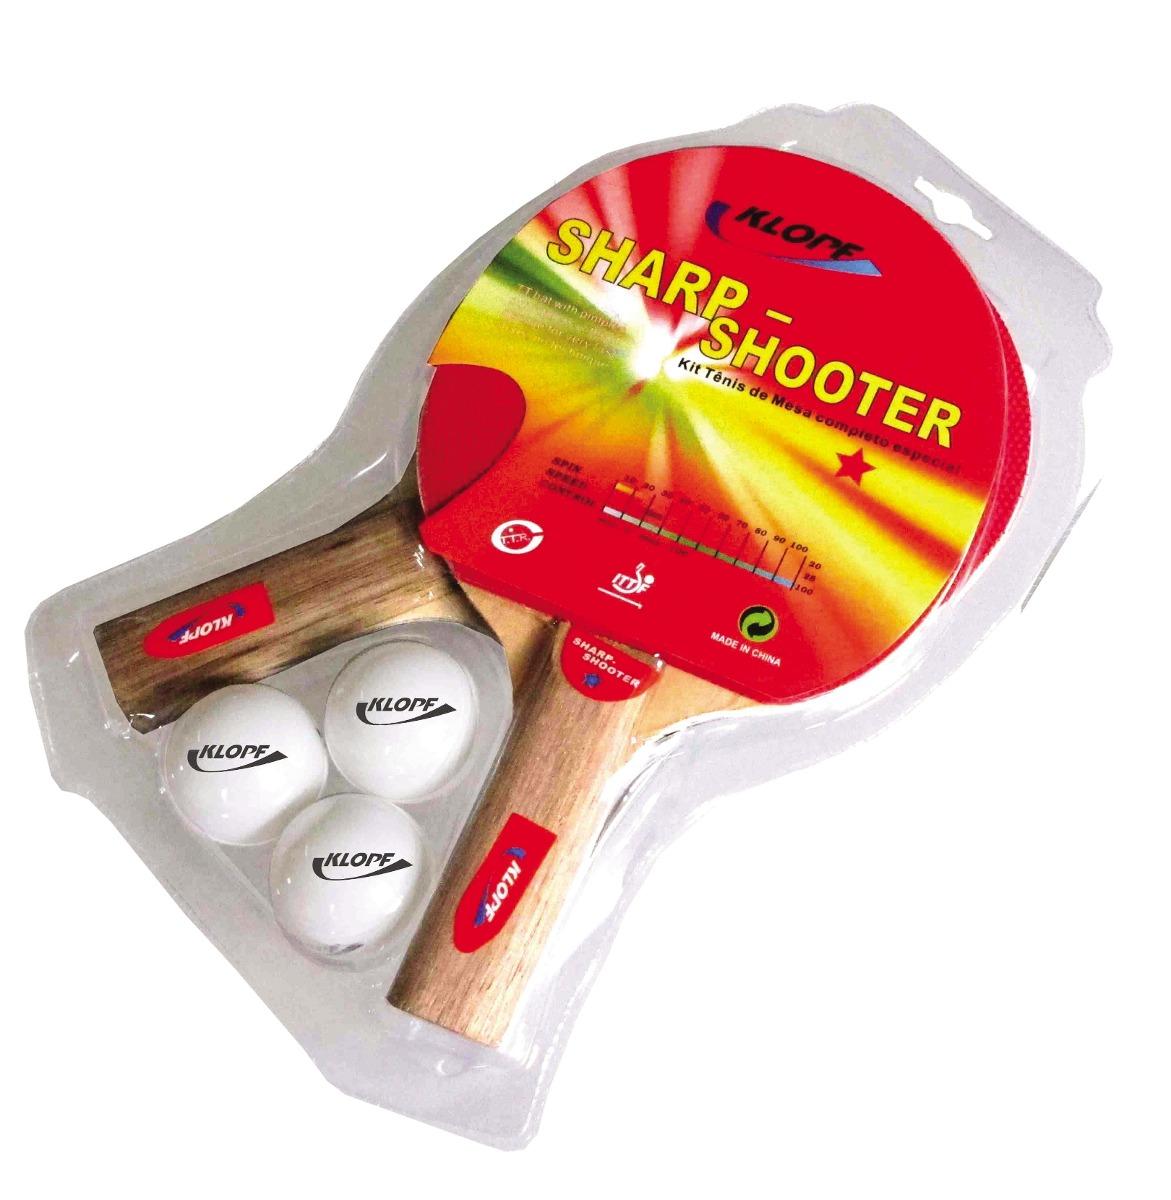 a9a479500 Kit Ping Pong Tênis Mesa Raquetes Rede Bolinhas Klopf  5030 - R  74 ...